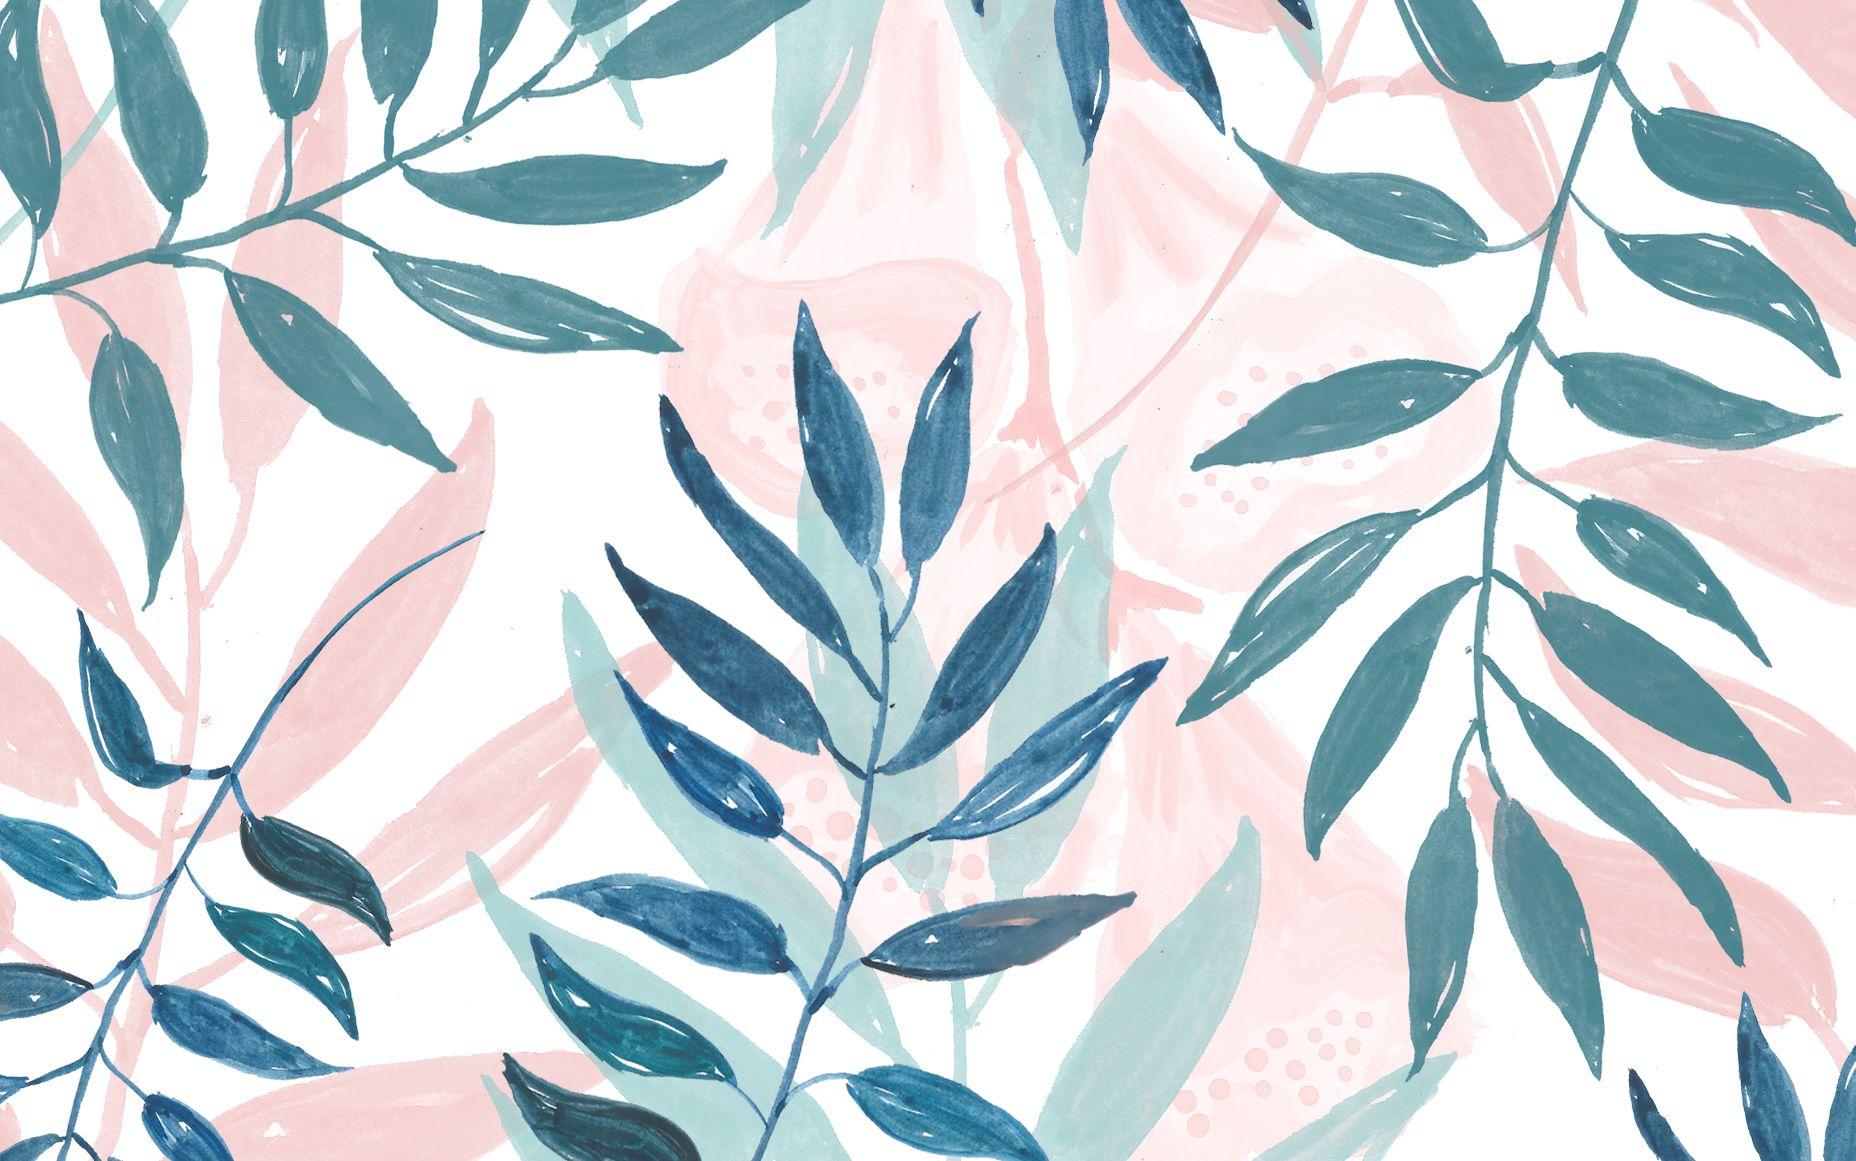 17 Best ideas about Laptop Wallpaper on Pinterest | Desktop ...